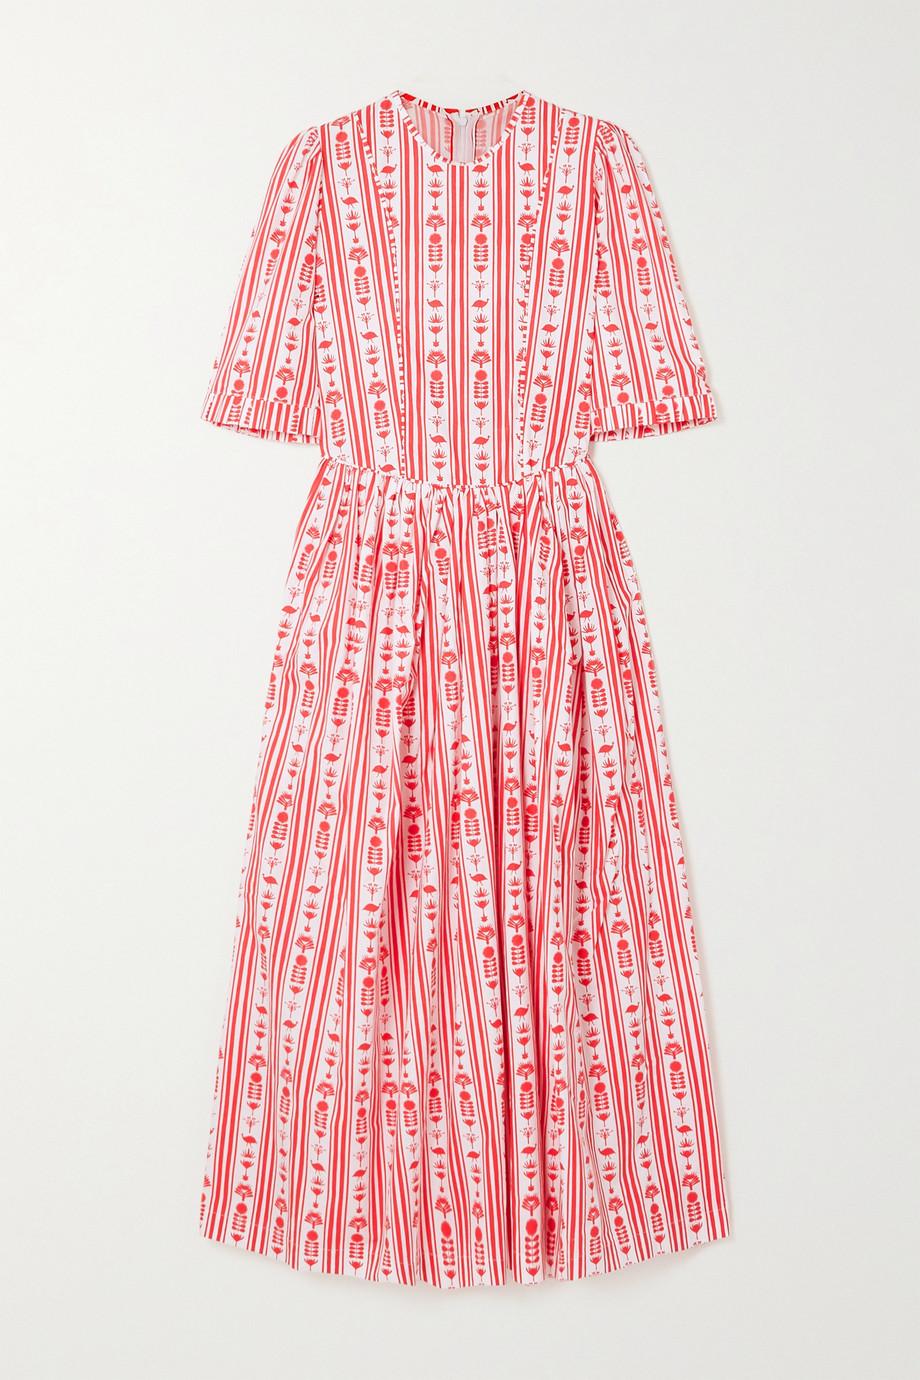 Sindiso Khumalo + NET SUSTAIN printed cotton maxi dress